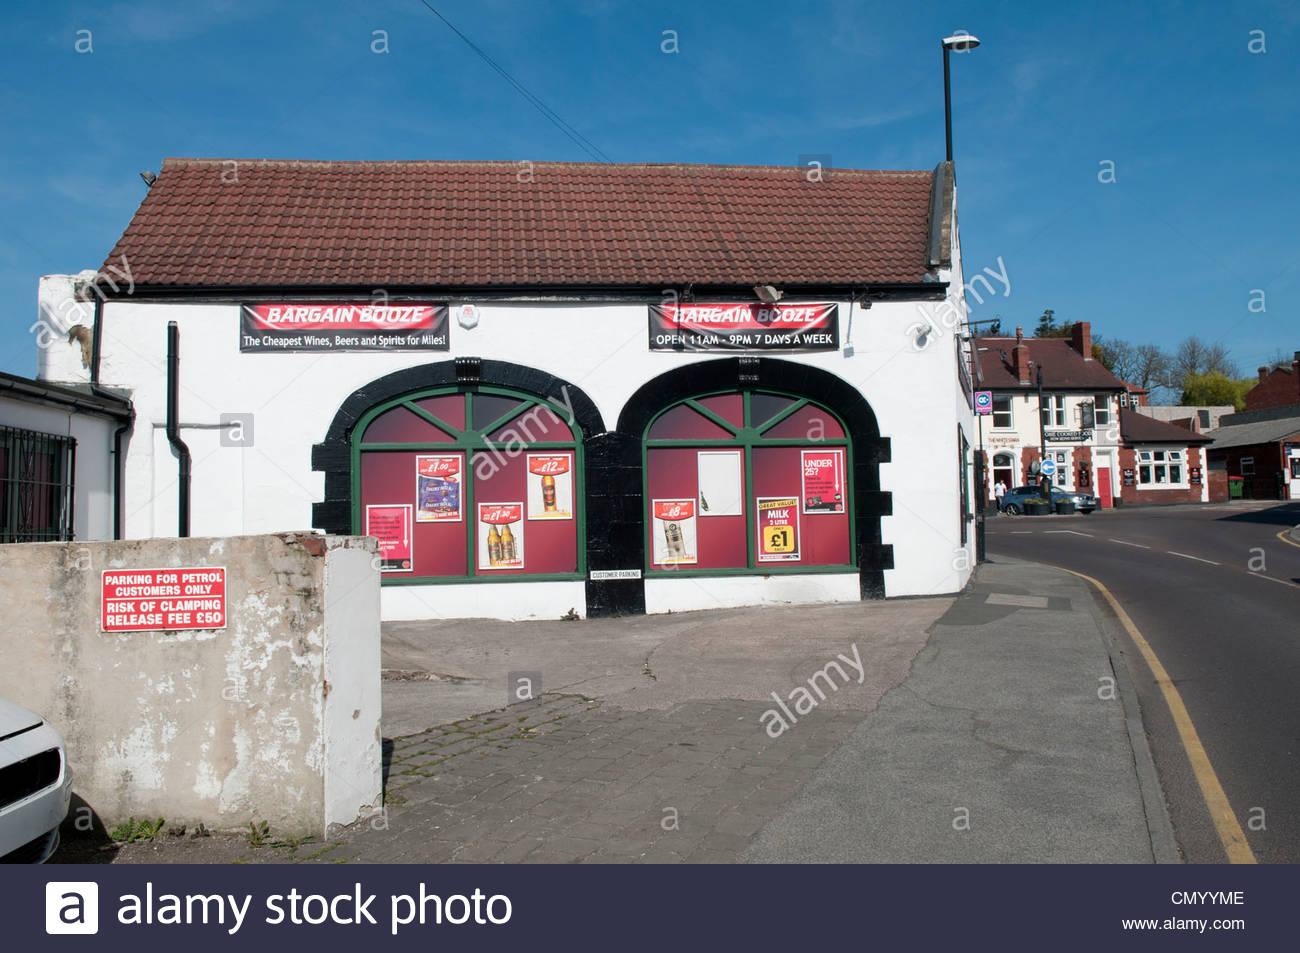 Bargain Booze White Swan pub in background Cross Hills Kippax 1300x953